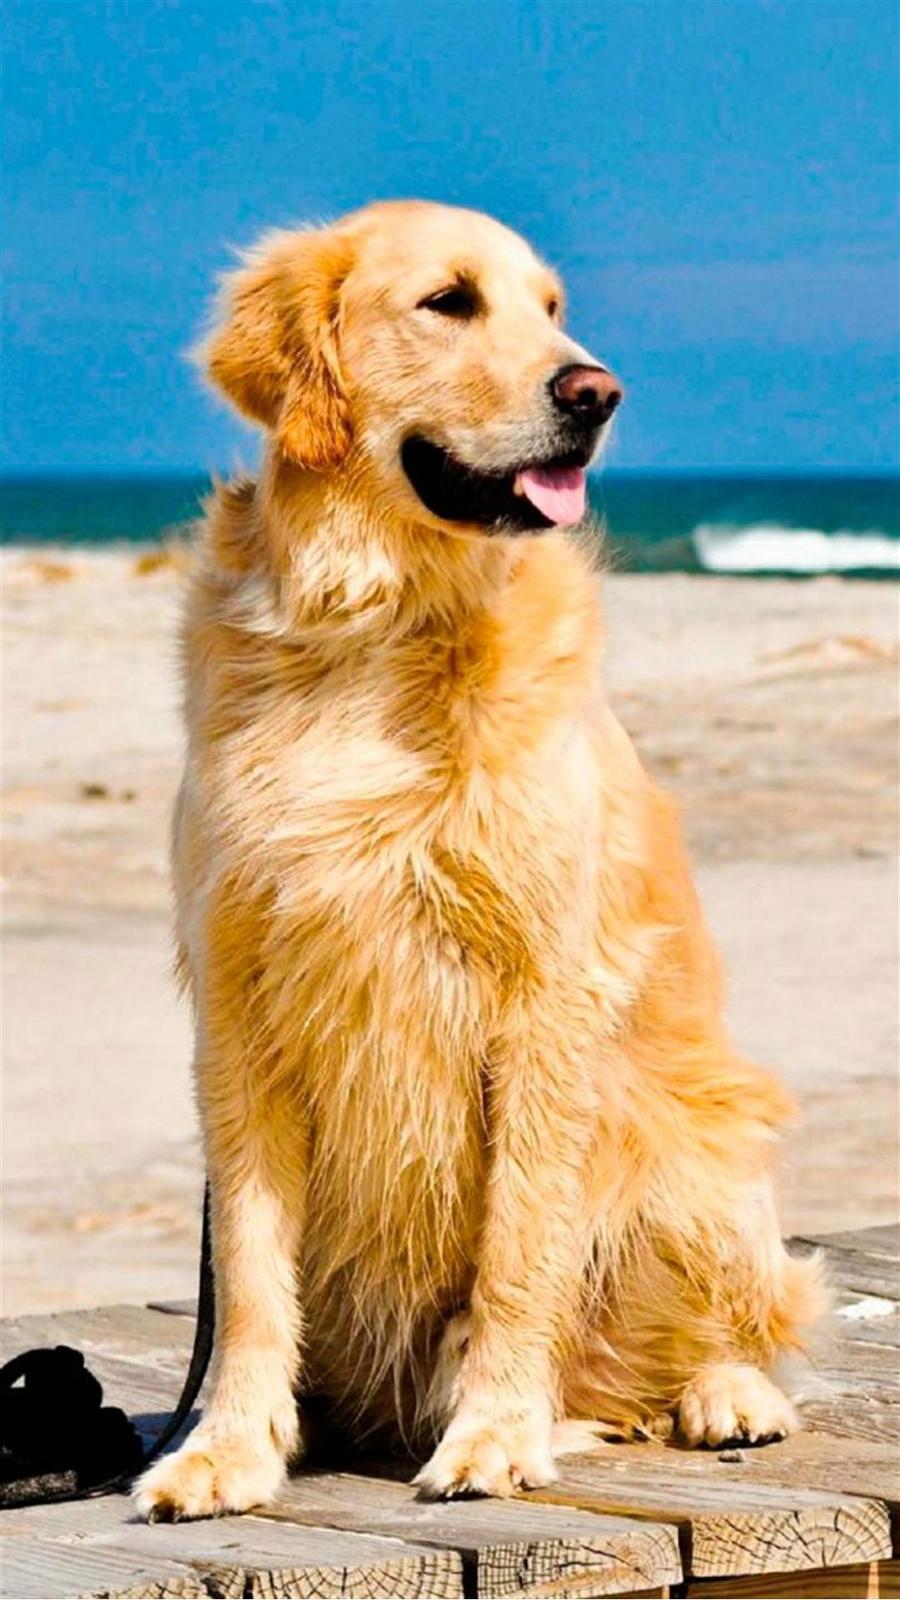 Cute Golden Beach 4K Wallpapers Free Download